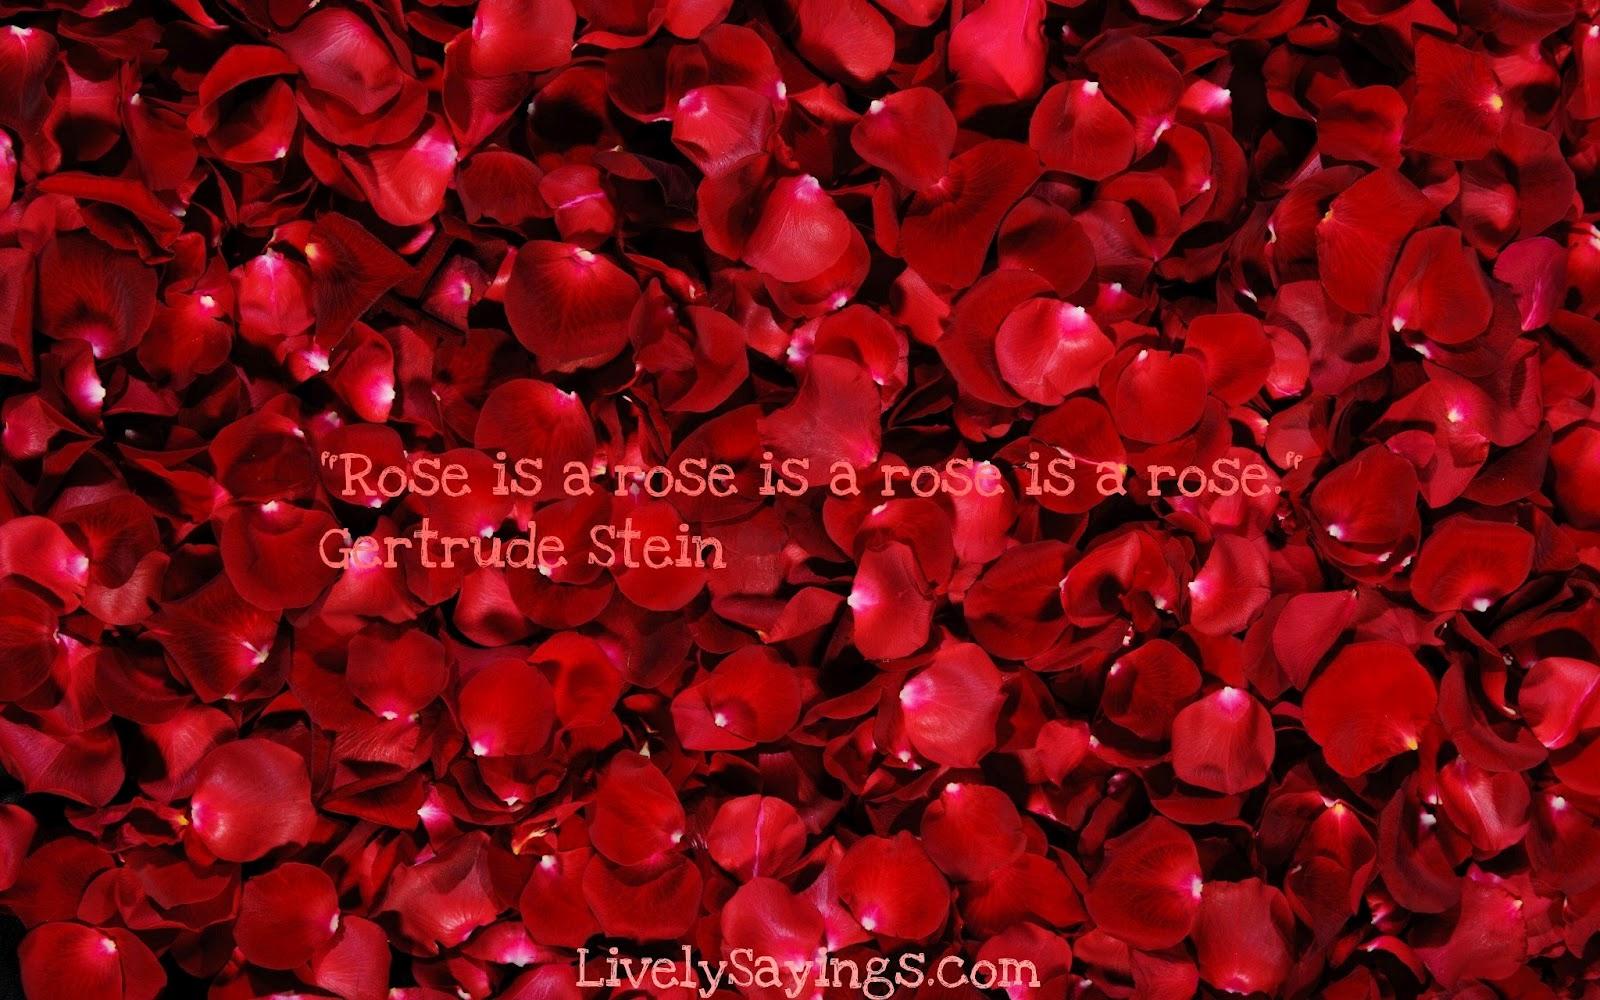 http://4.bp.blogspot.com/-b7vS_TmZotU/T7-DD0LcUoI/AAAAAAAAAbk/cRY3tYxX-4s/s1600/rosepetals-299892.jpeg